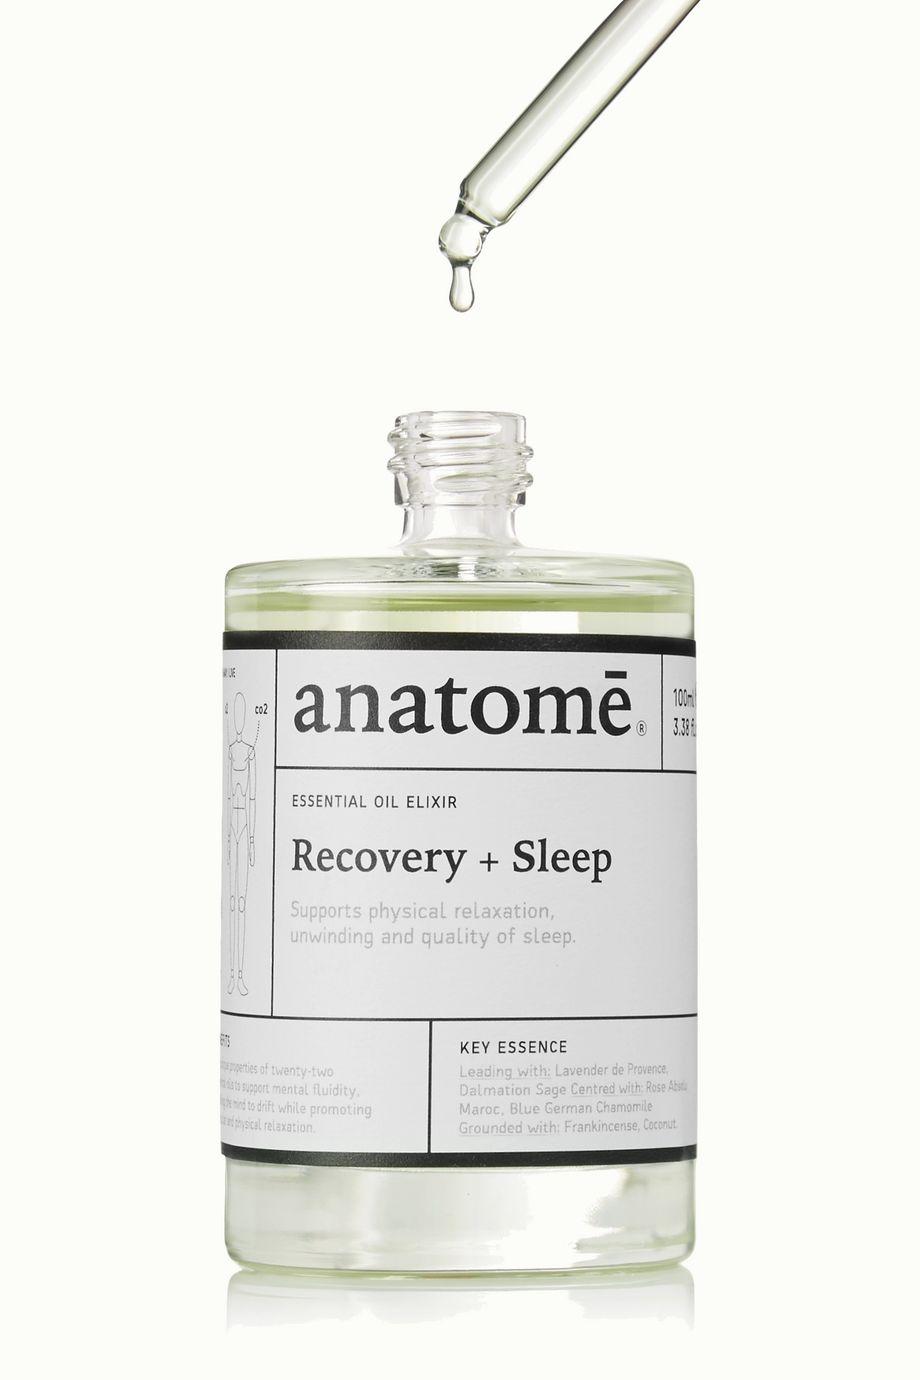 anatomē Essential Oil Elixir - Recovery + Sleep, 100ml